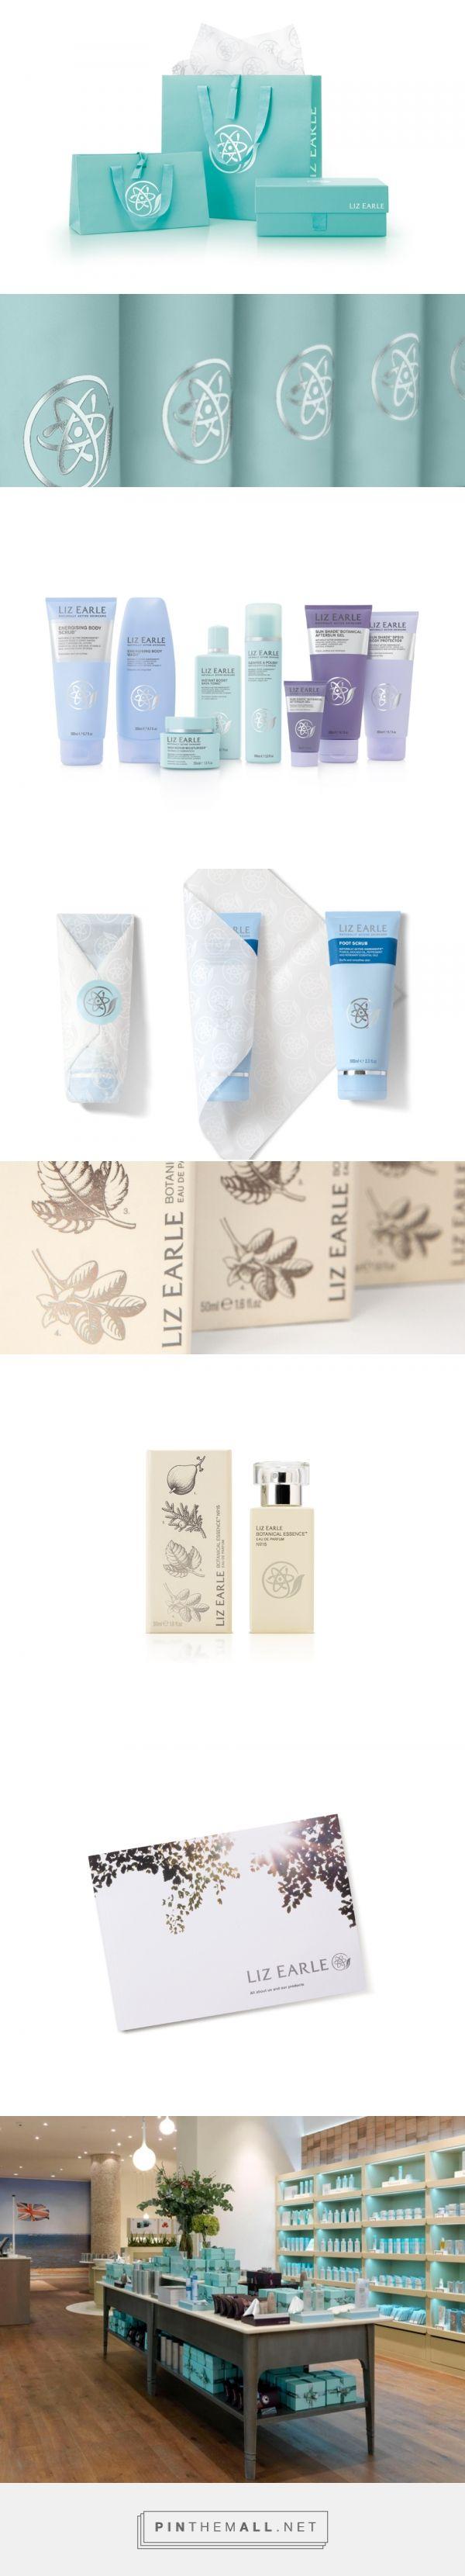 Turner Duckworth — Liz Earle - Designing a Brand's Material Culture   Fivestar Branding – Design and Branding Agency & Inspiration Gallery